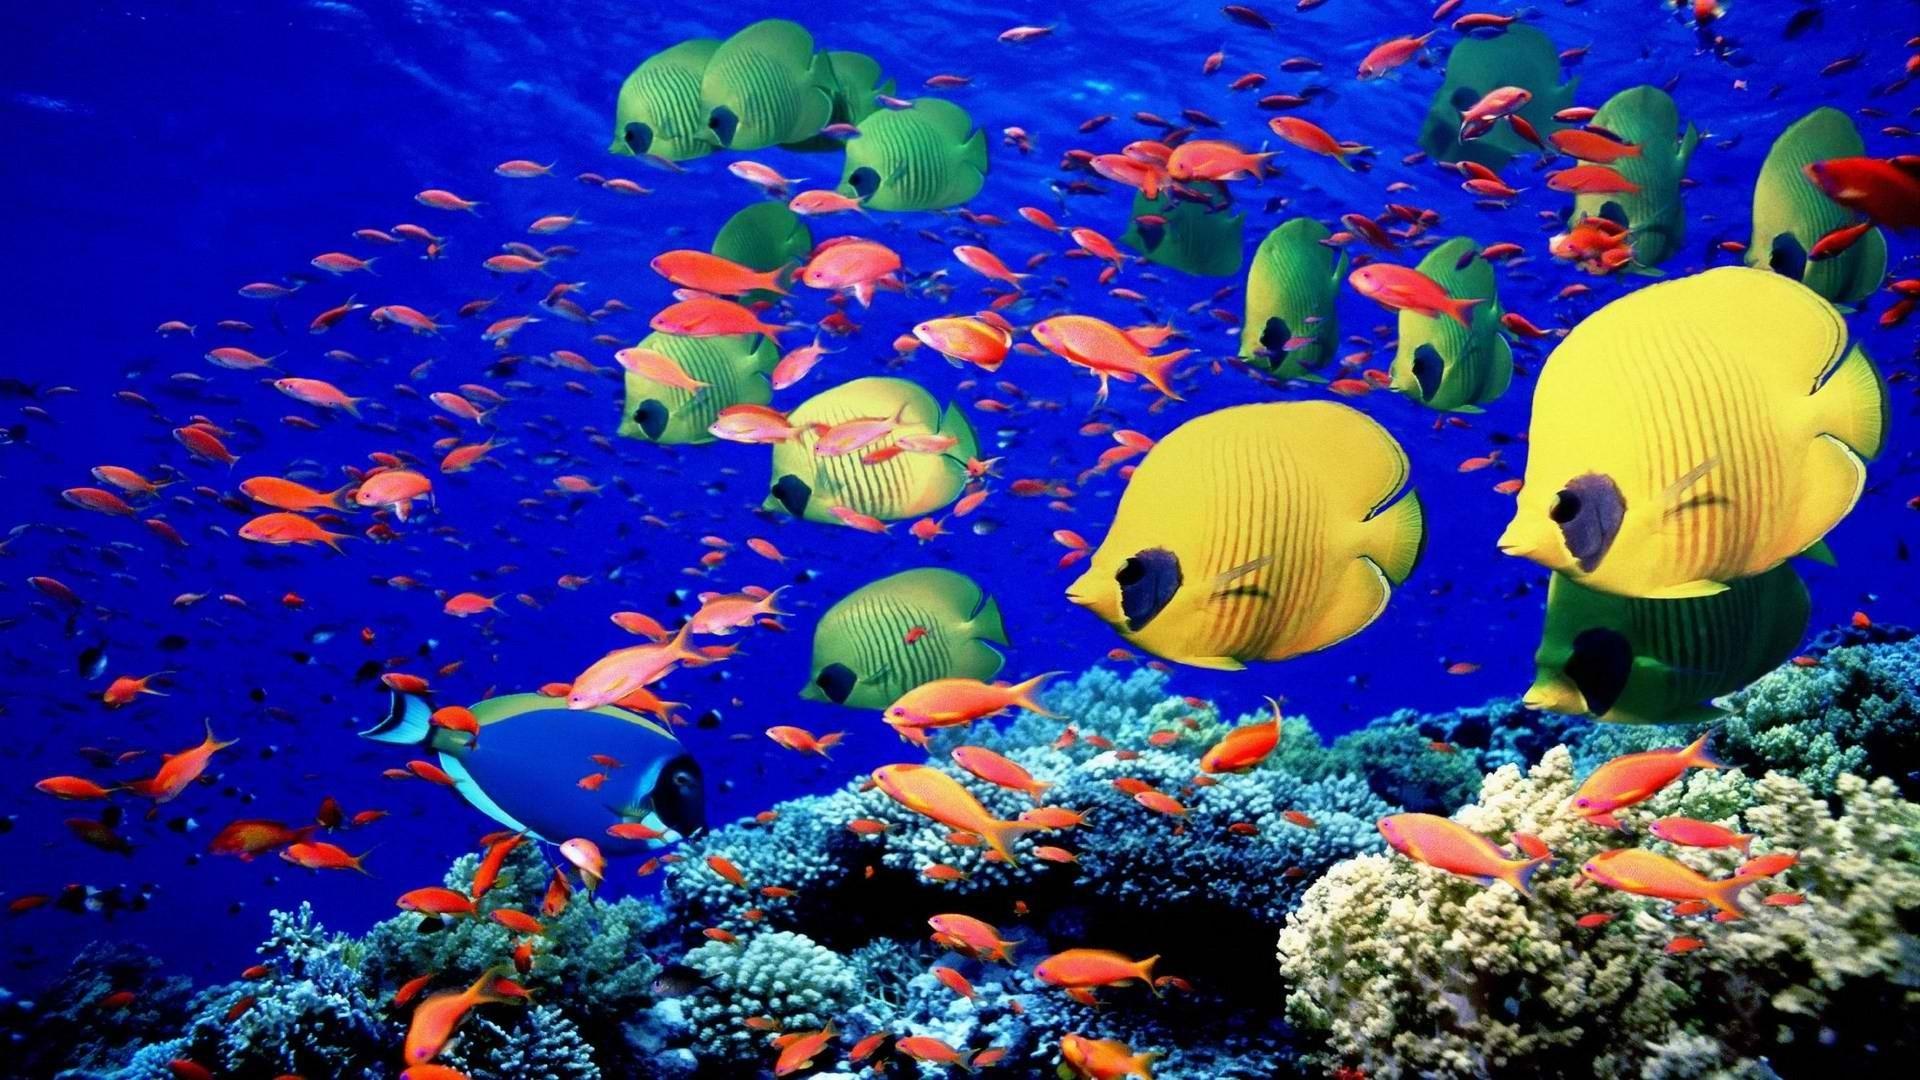 Caribbean Sea Creatures: Animals Fishes Underwater Swim Coral Reef Colors Bright